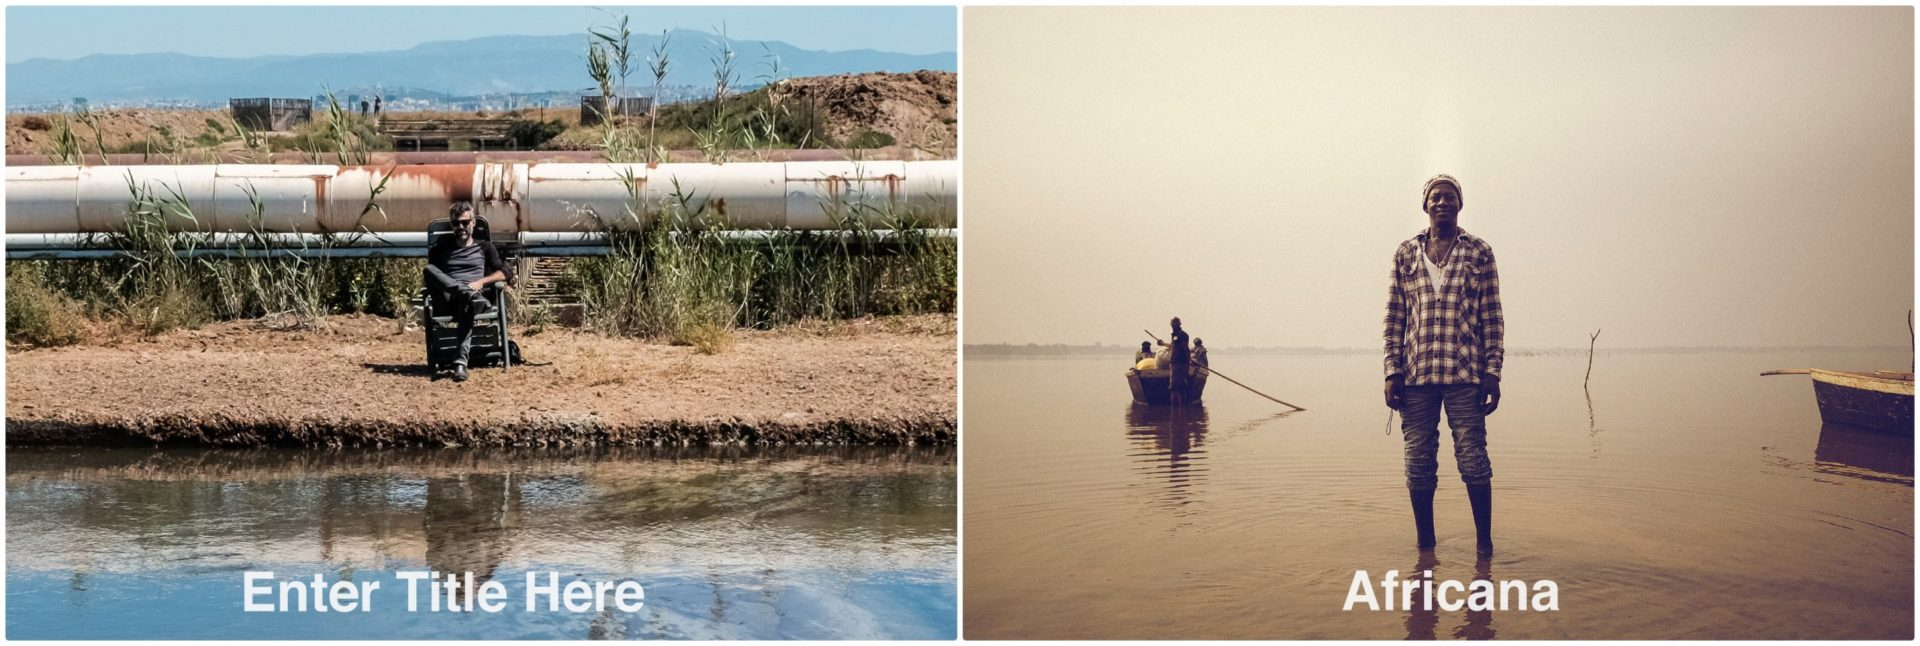 ENTERTITLEHERE AFRICANA2 copia scaled - Milano Photofestival